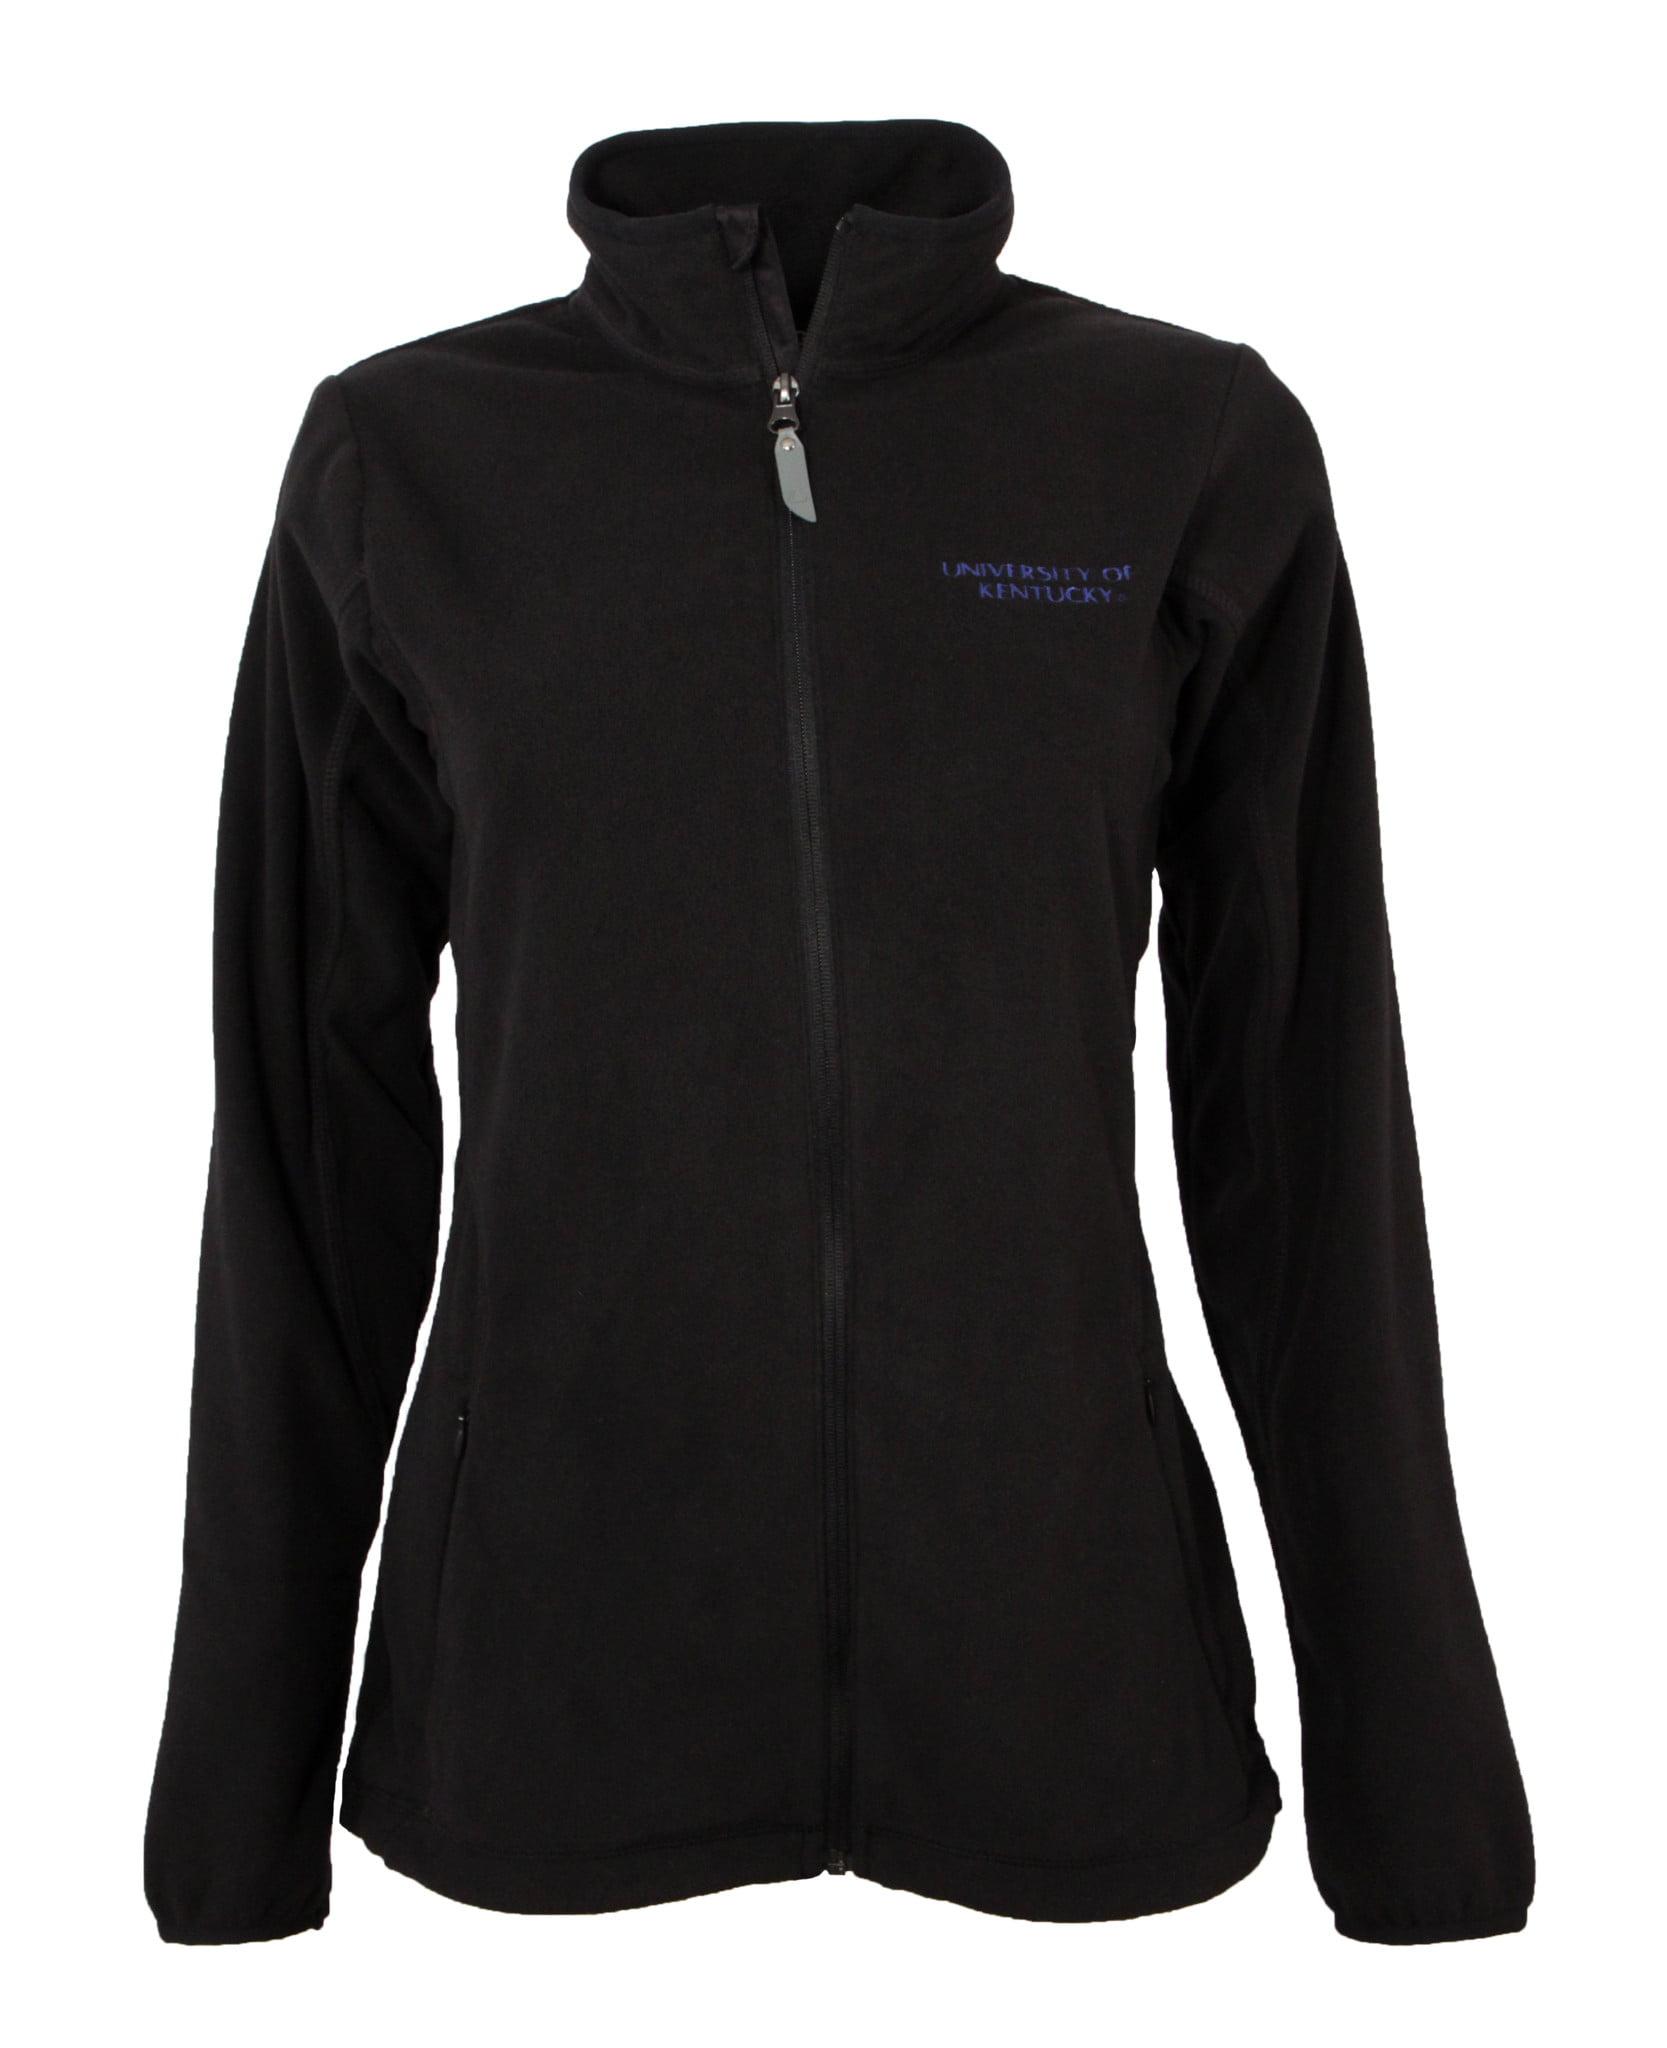 Ladies University of Kentucky Full-Zip Fleece Jacket by